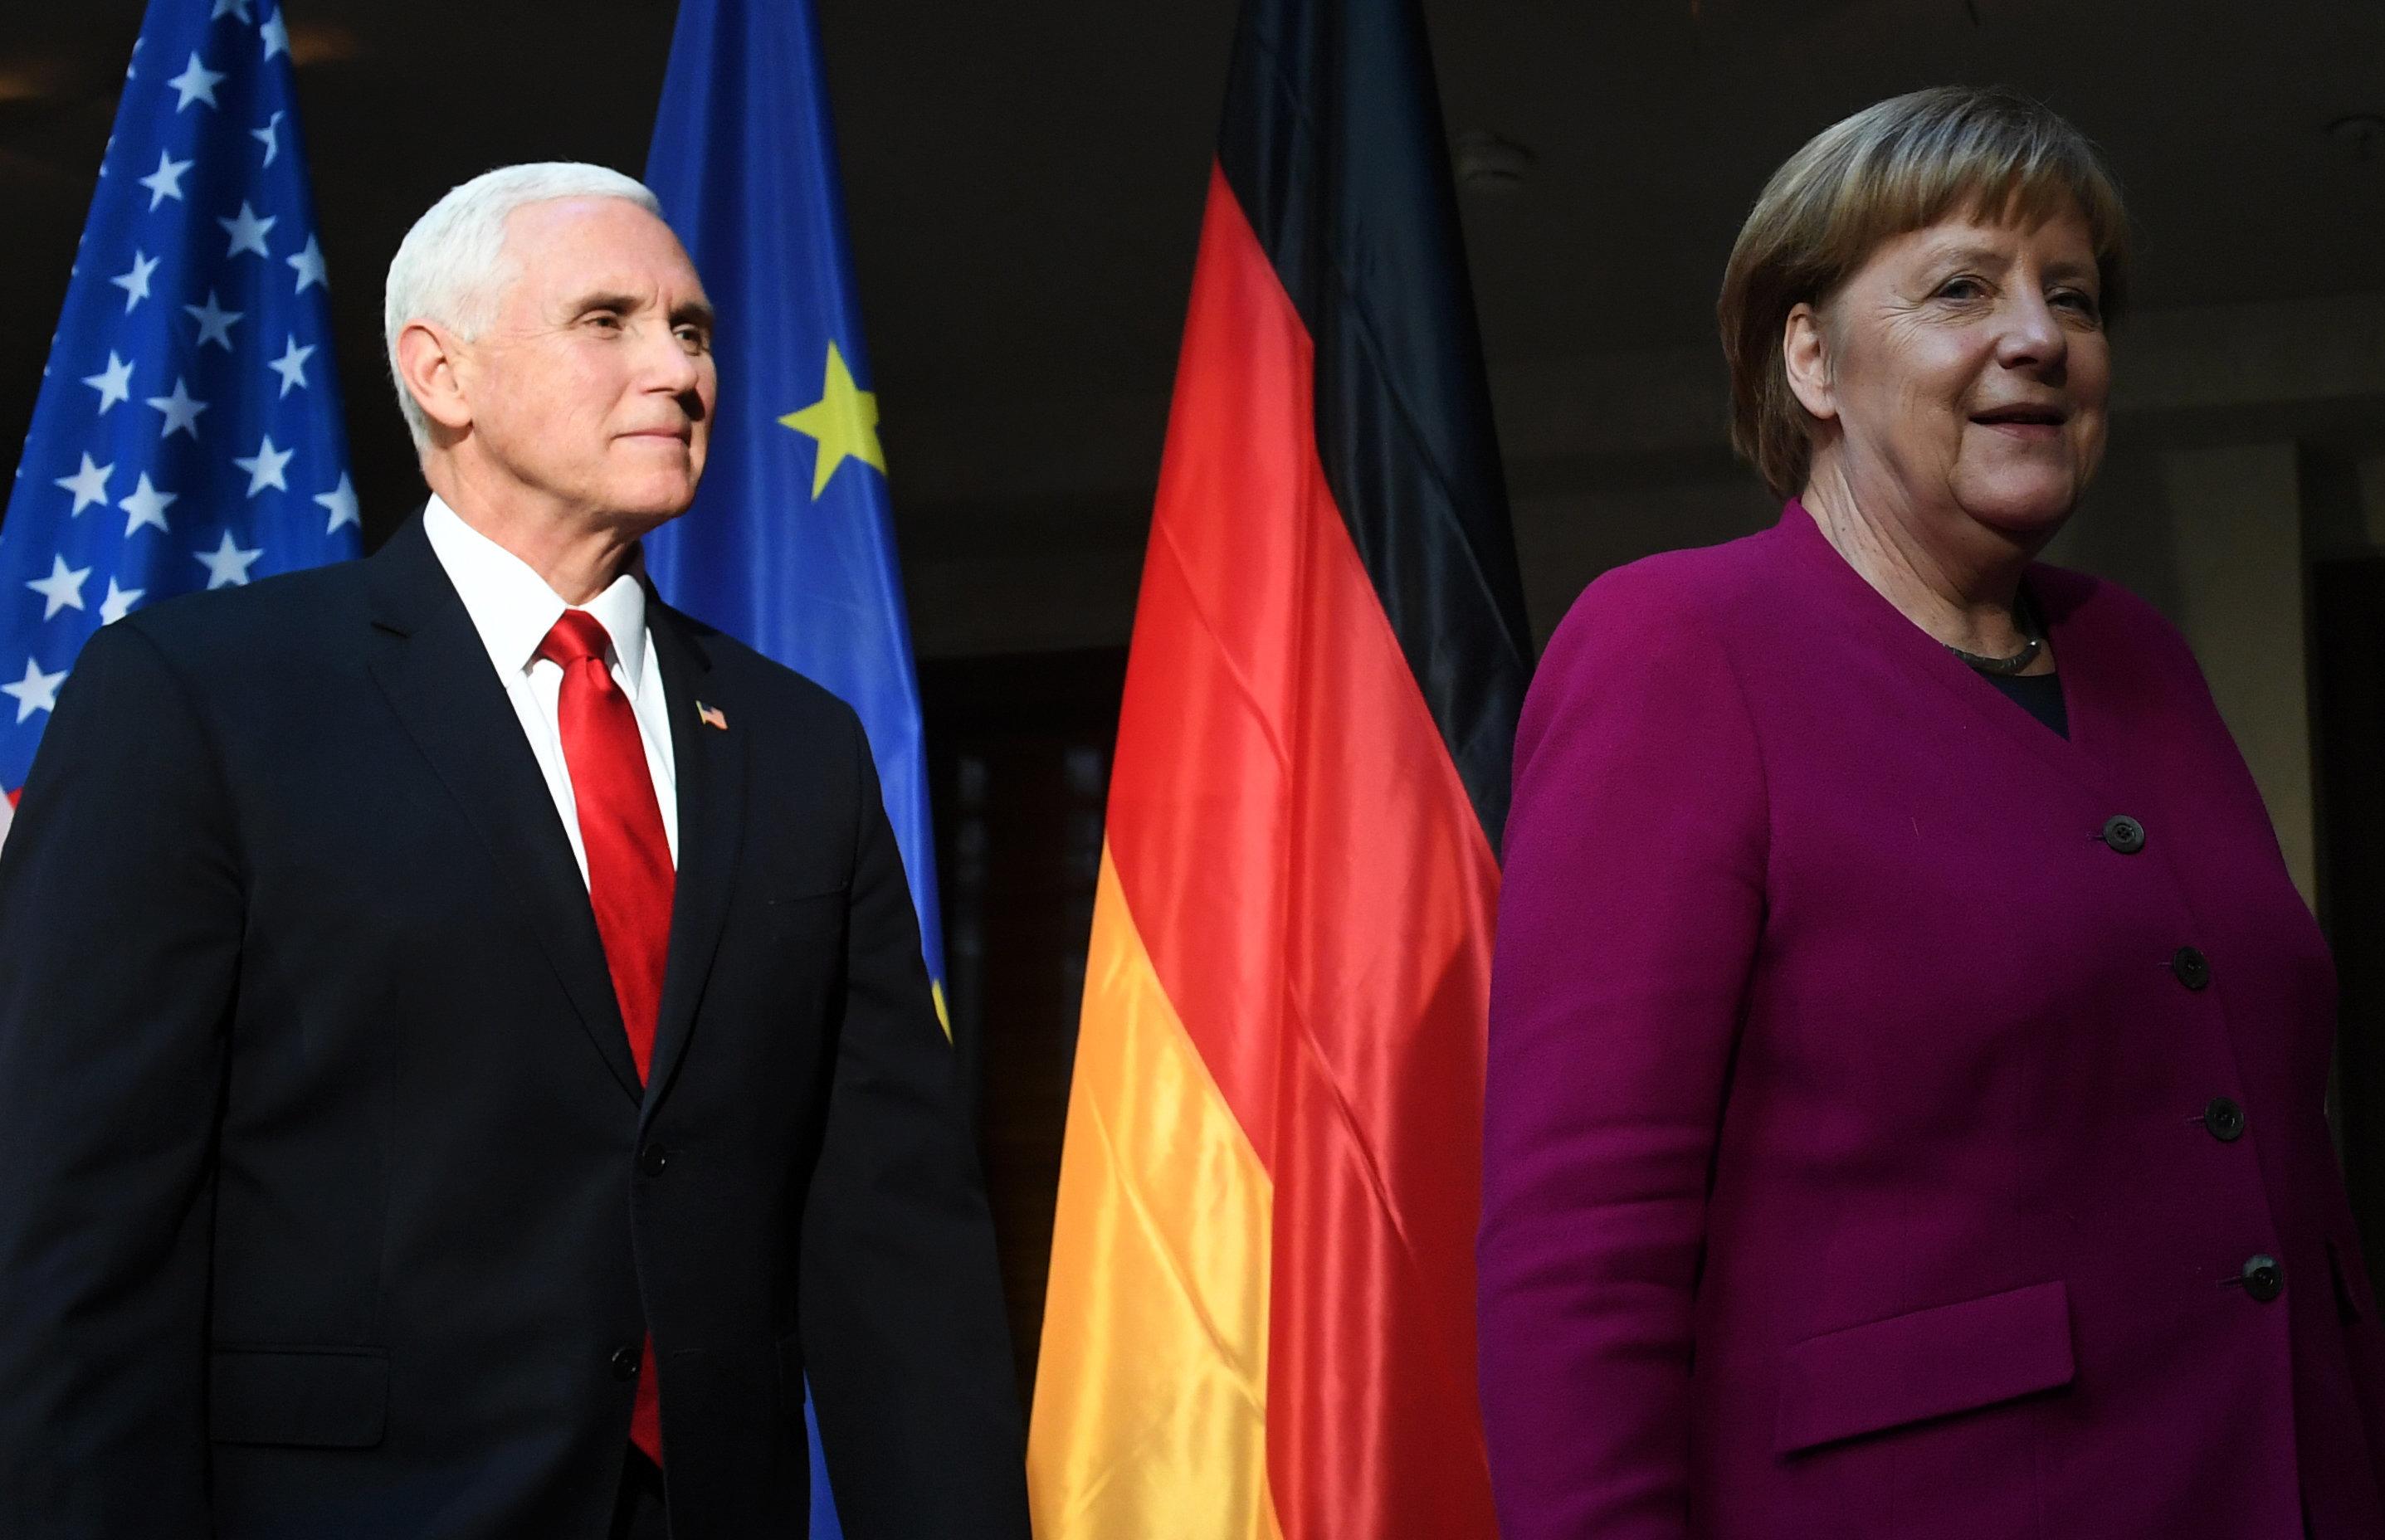 H αντιπαράθεση ΗΠΑ - Γερμανίας και η στρατηγική διάσπαση της